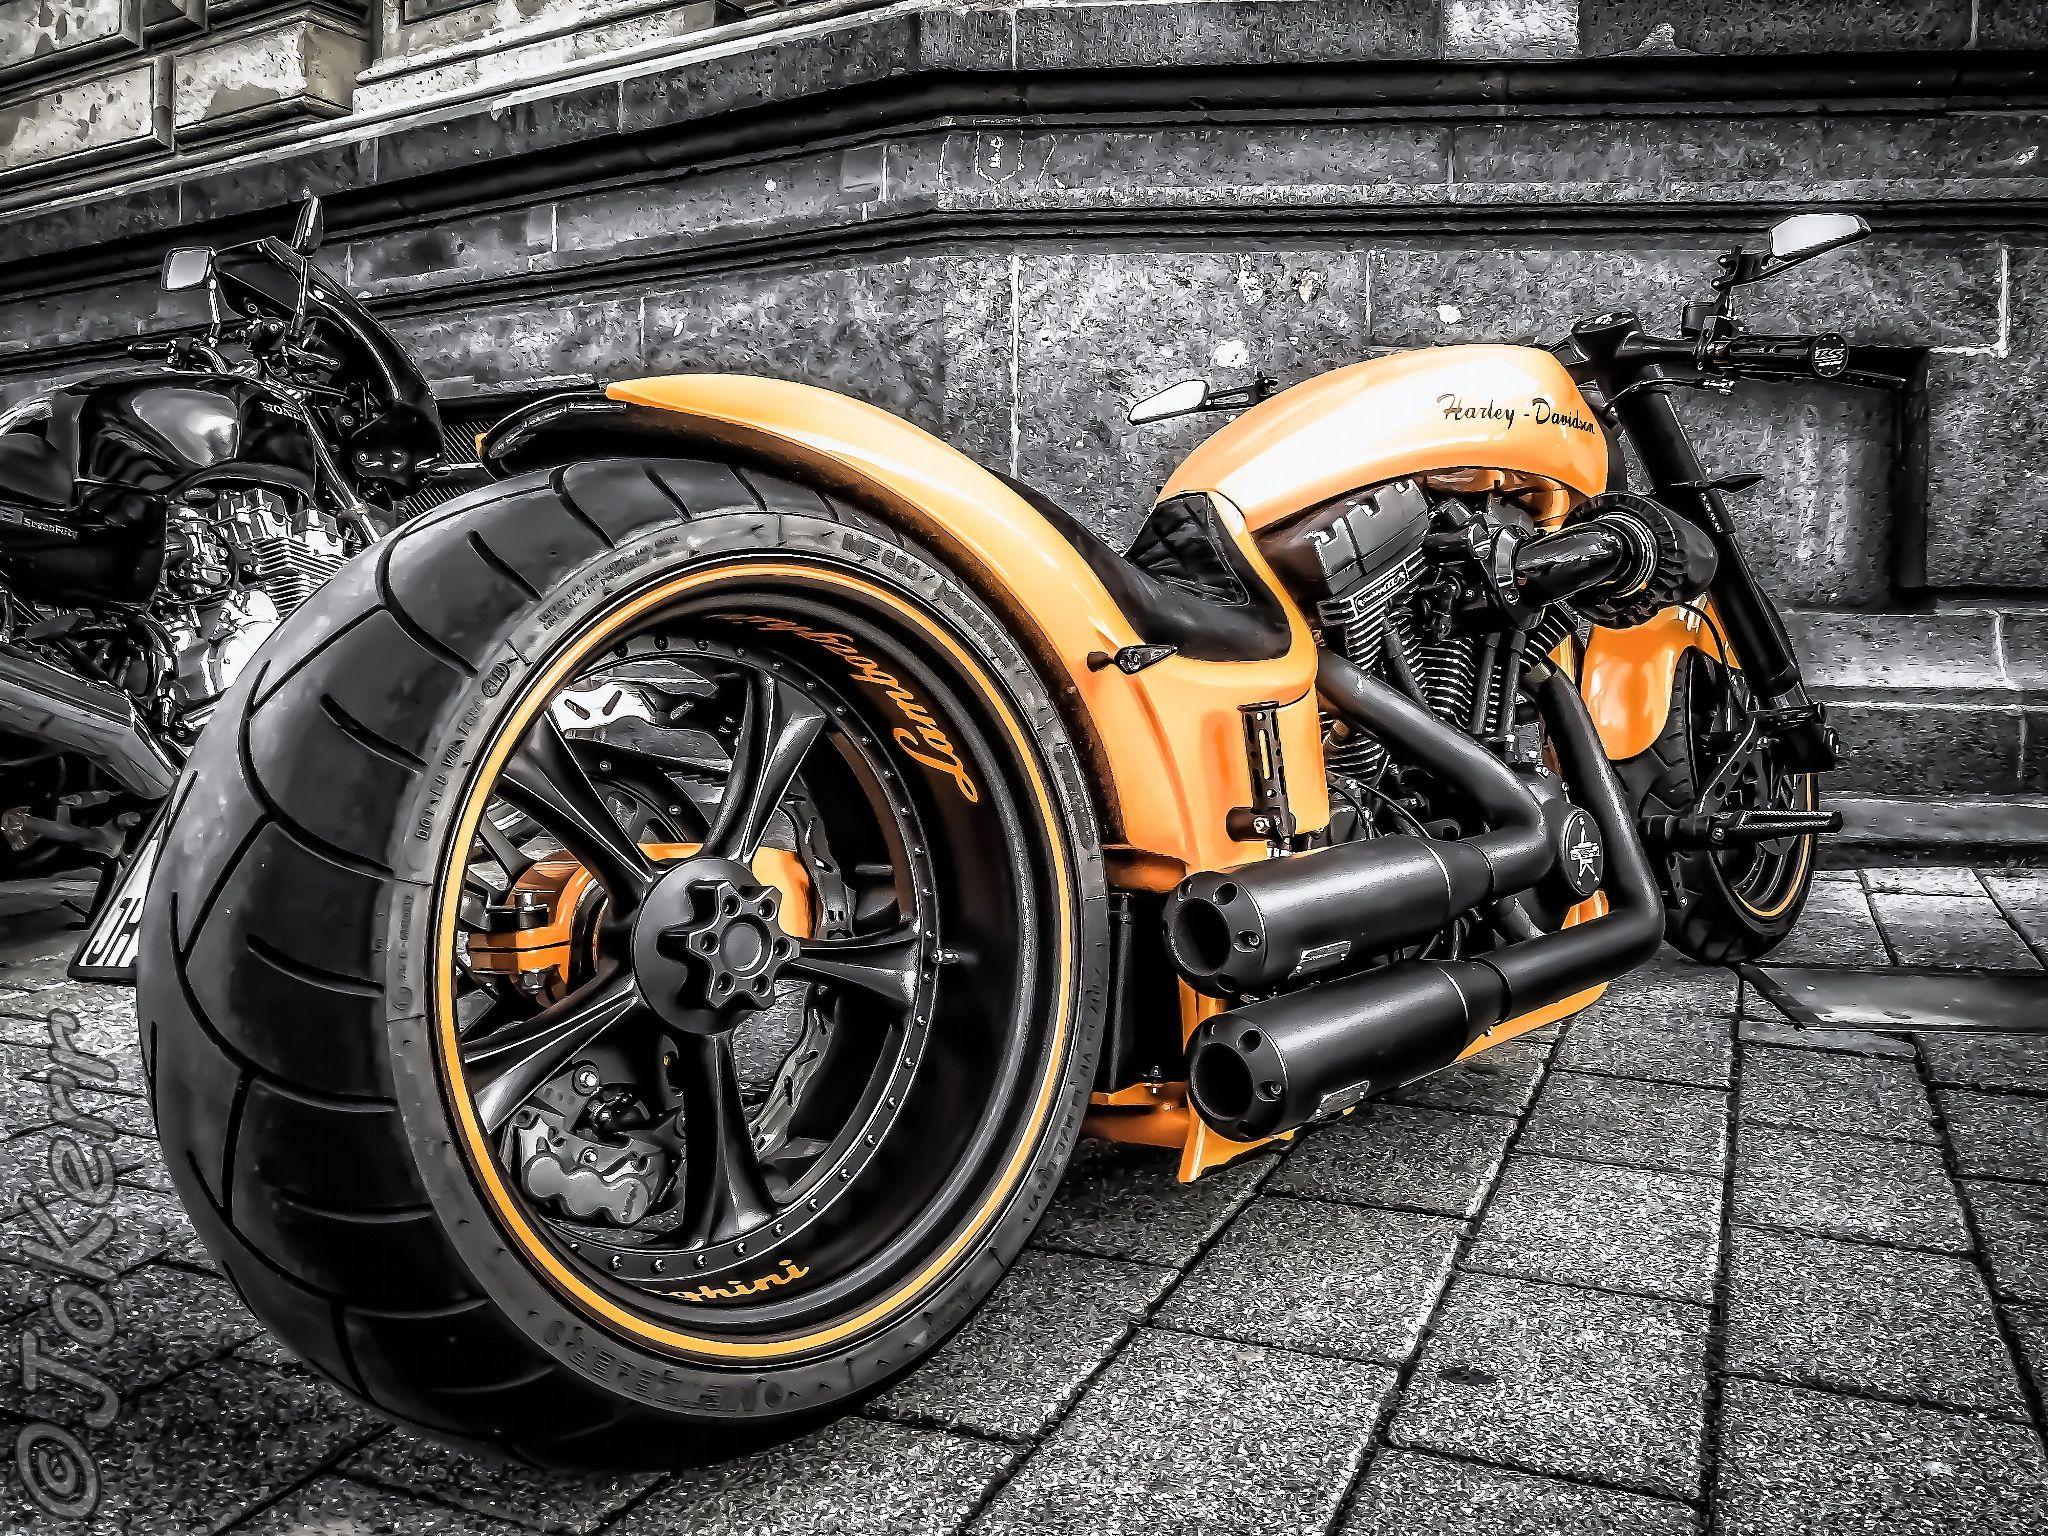 Photograph Harley Davidson RS Lambo by Jo Kerr on 500px